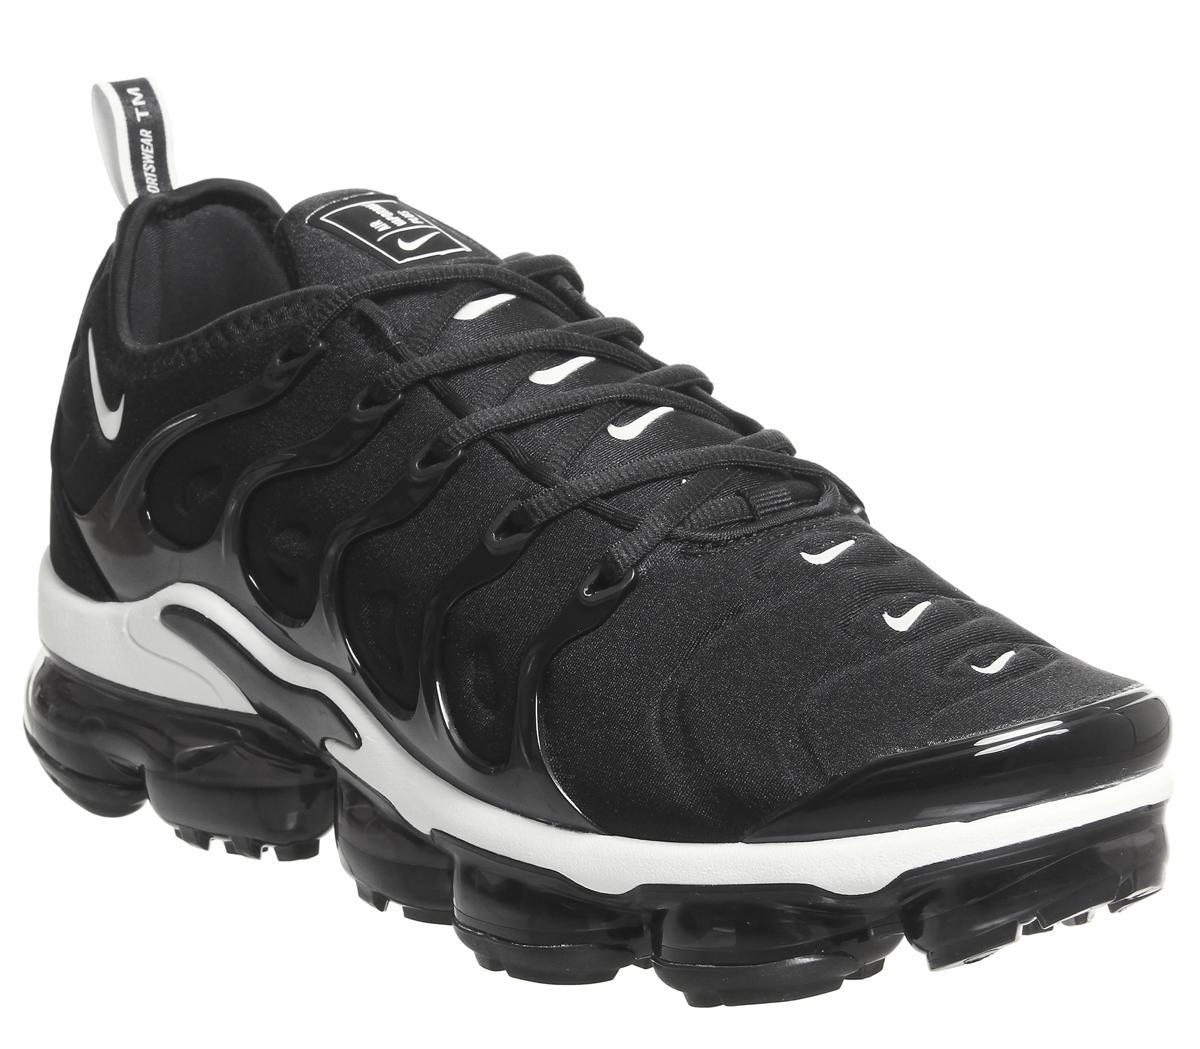 Nike Vapormax Air Vapormax Plus Black